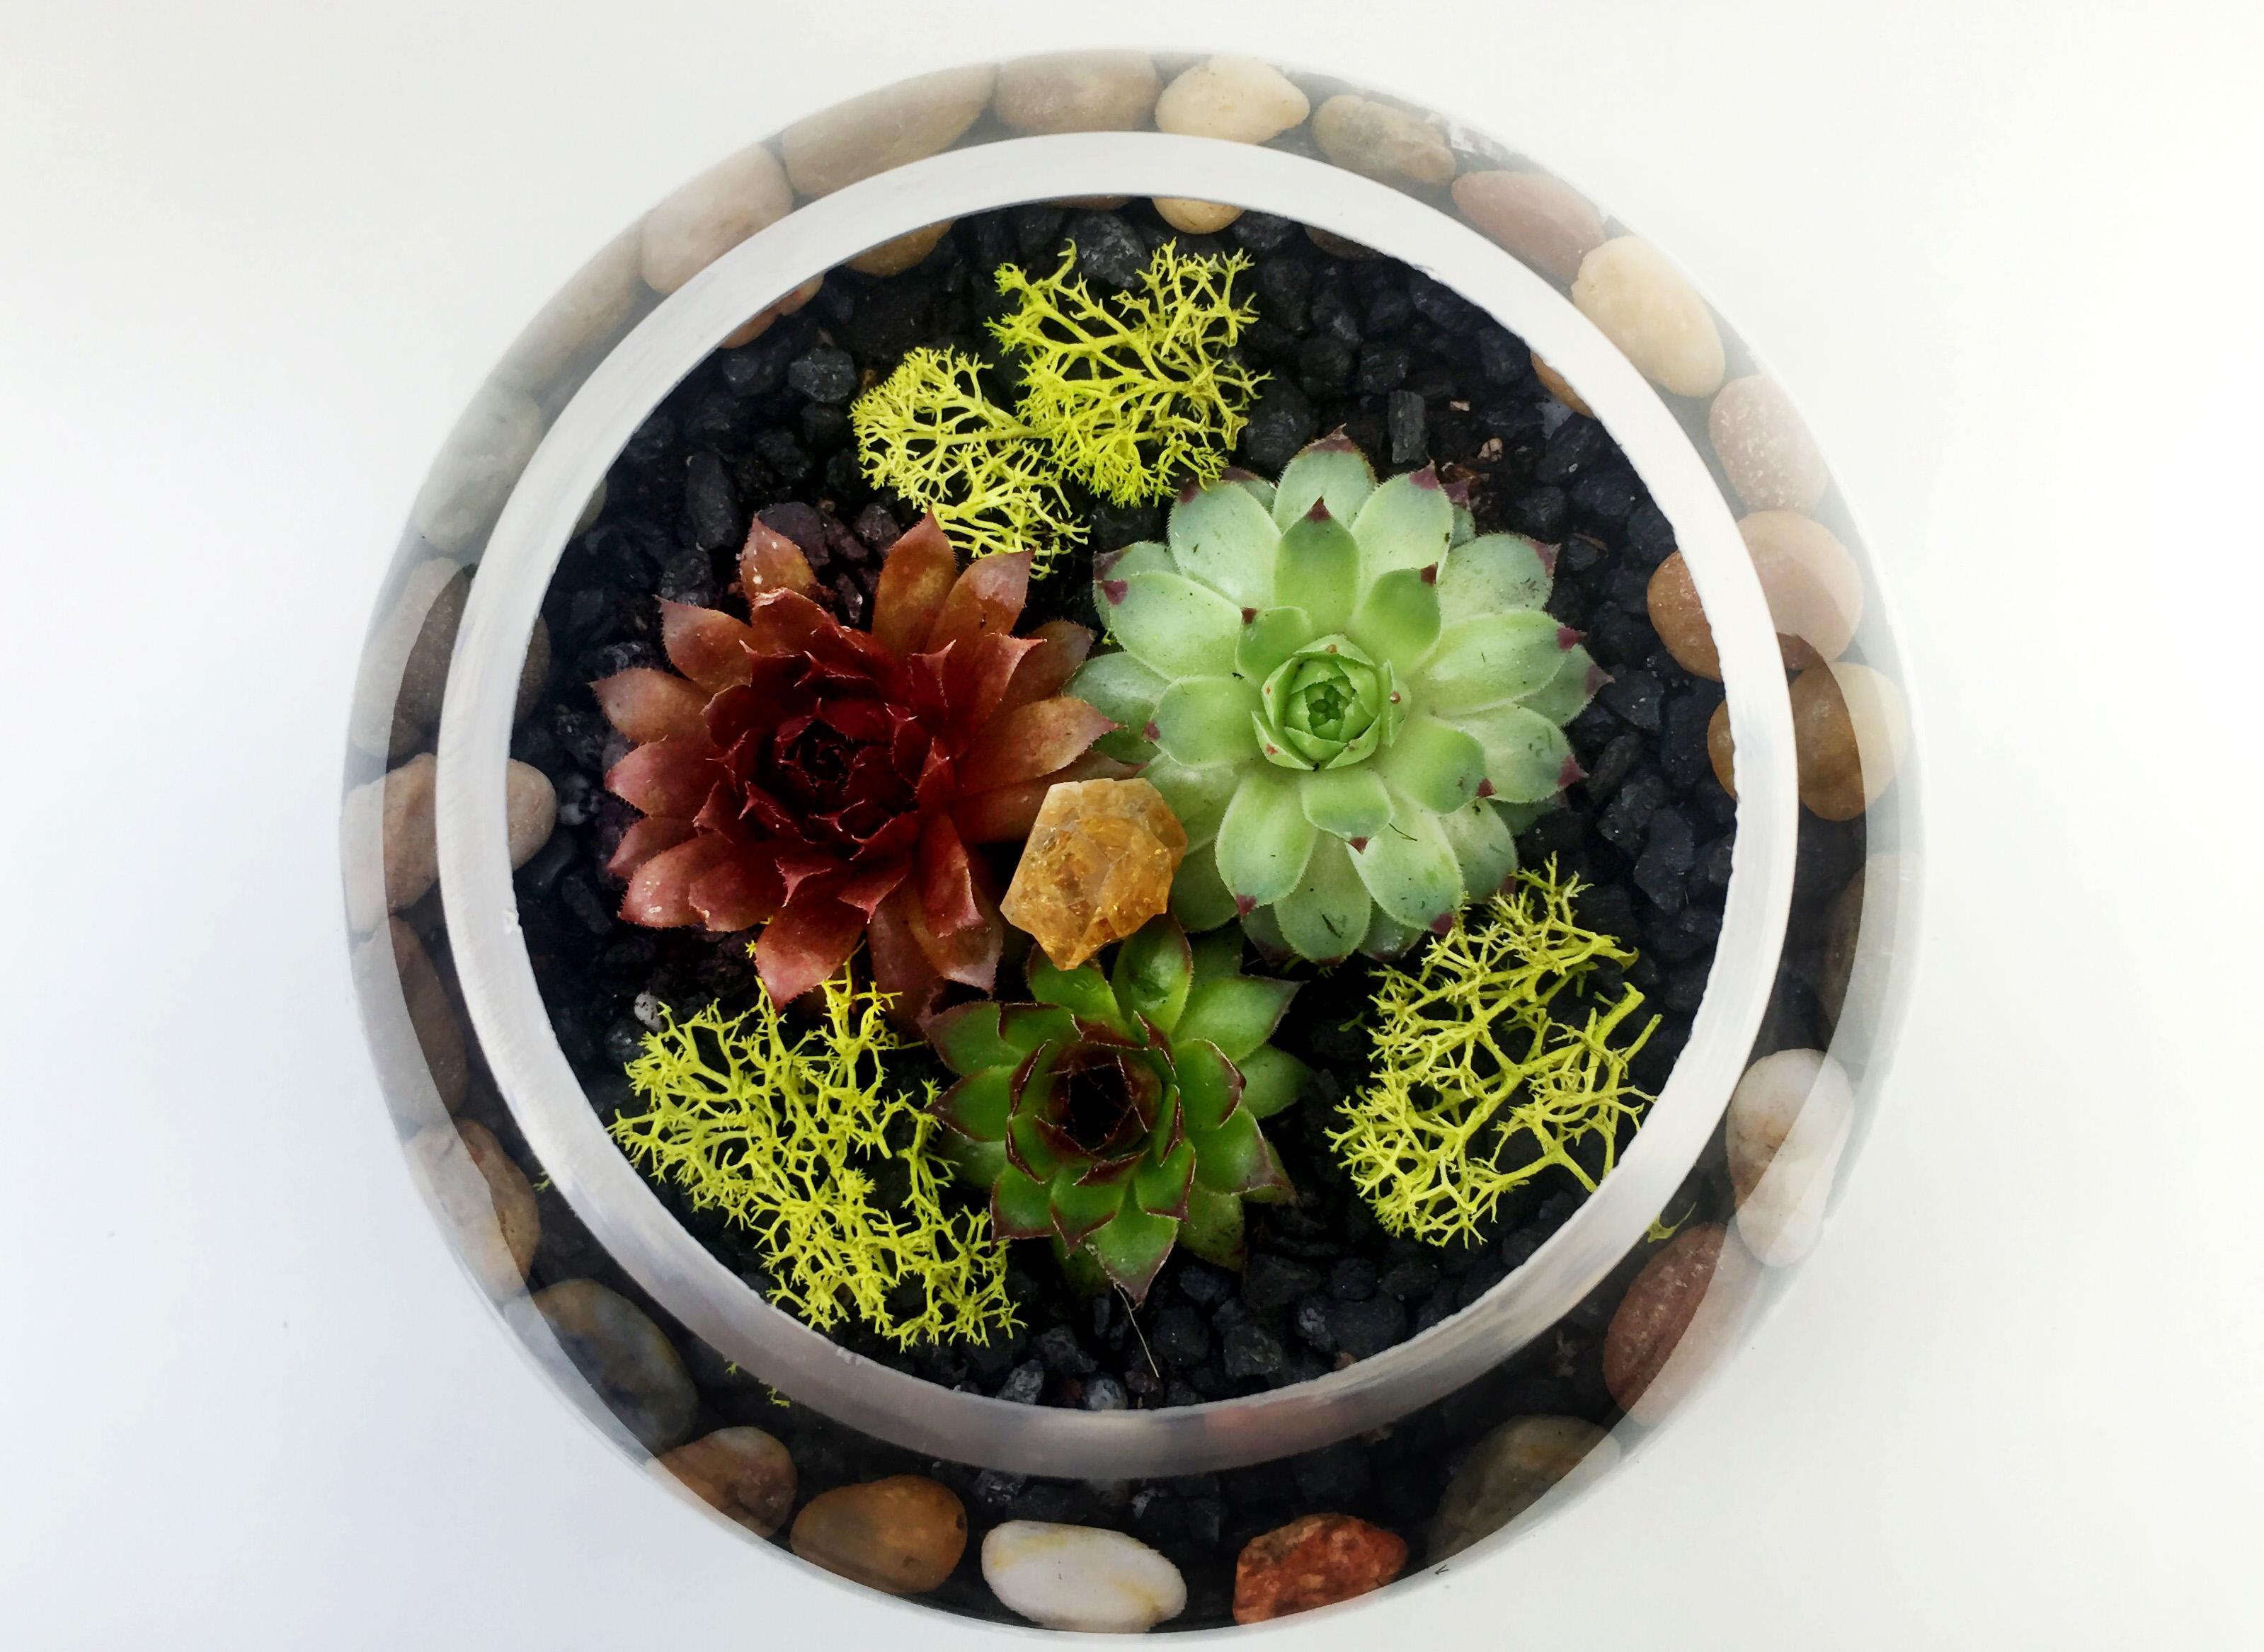 Glass Rose Bowl Succulent Terrarium with Citrine Quartz Crystal at Gideon  WellesPrivateFundraiserSpecial